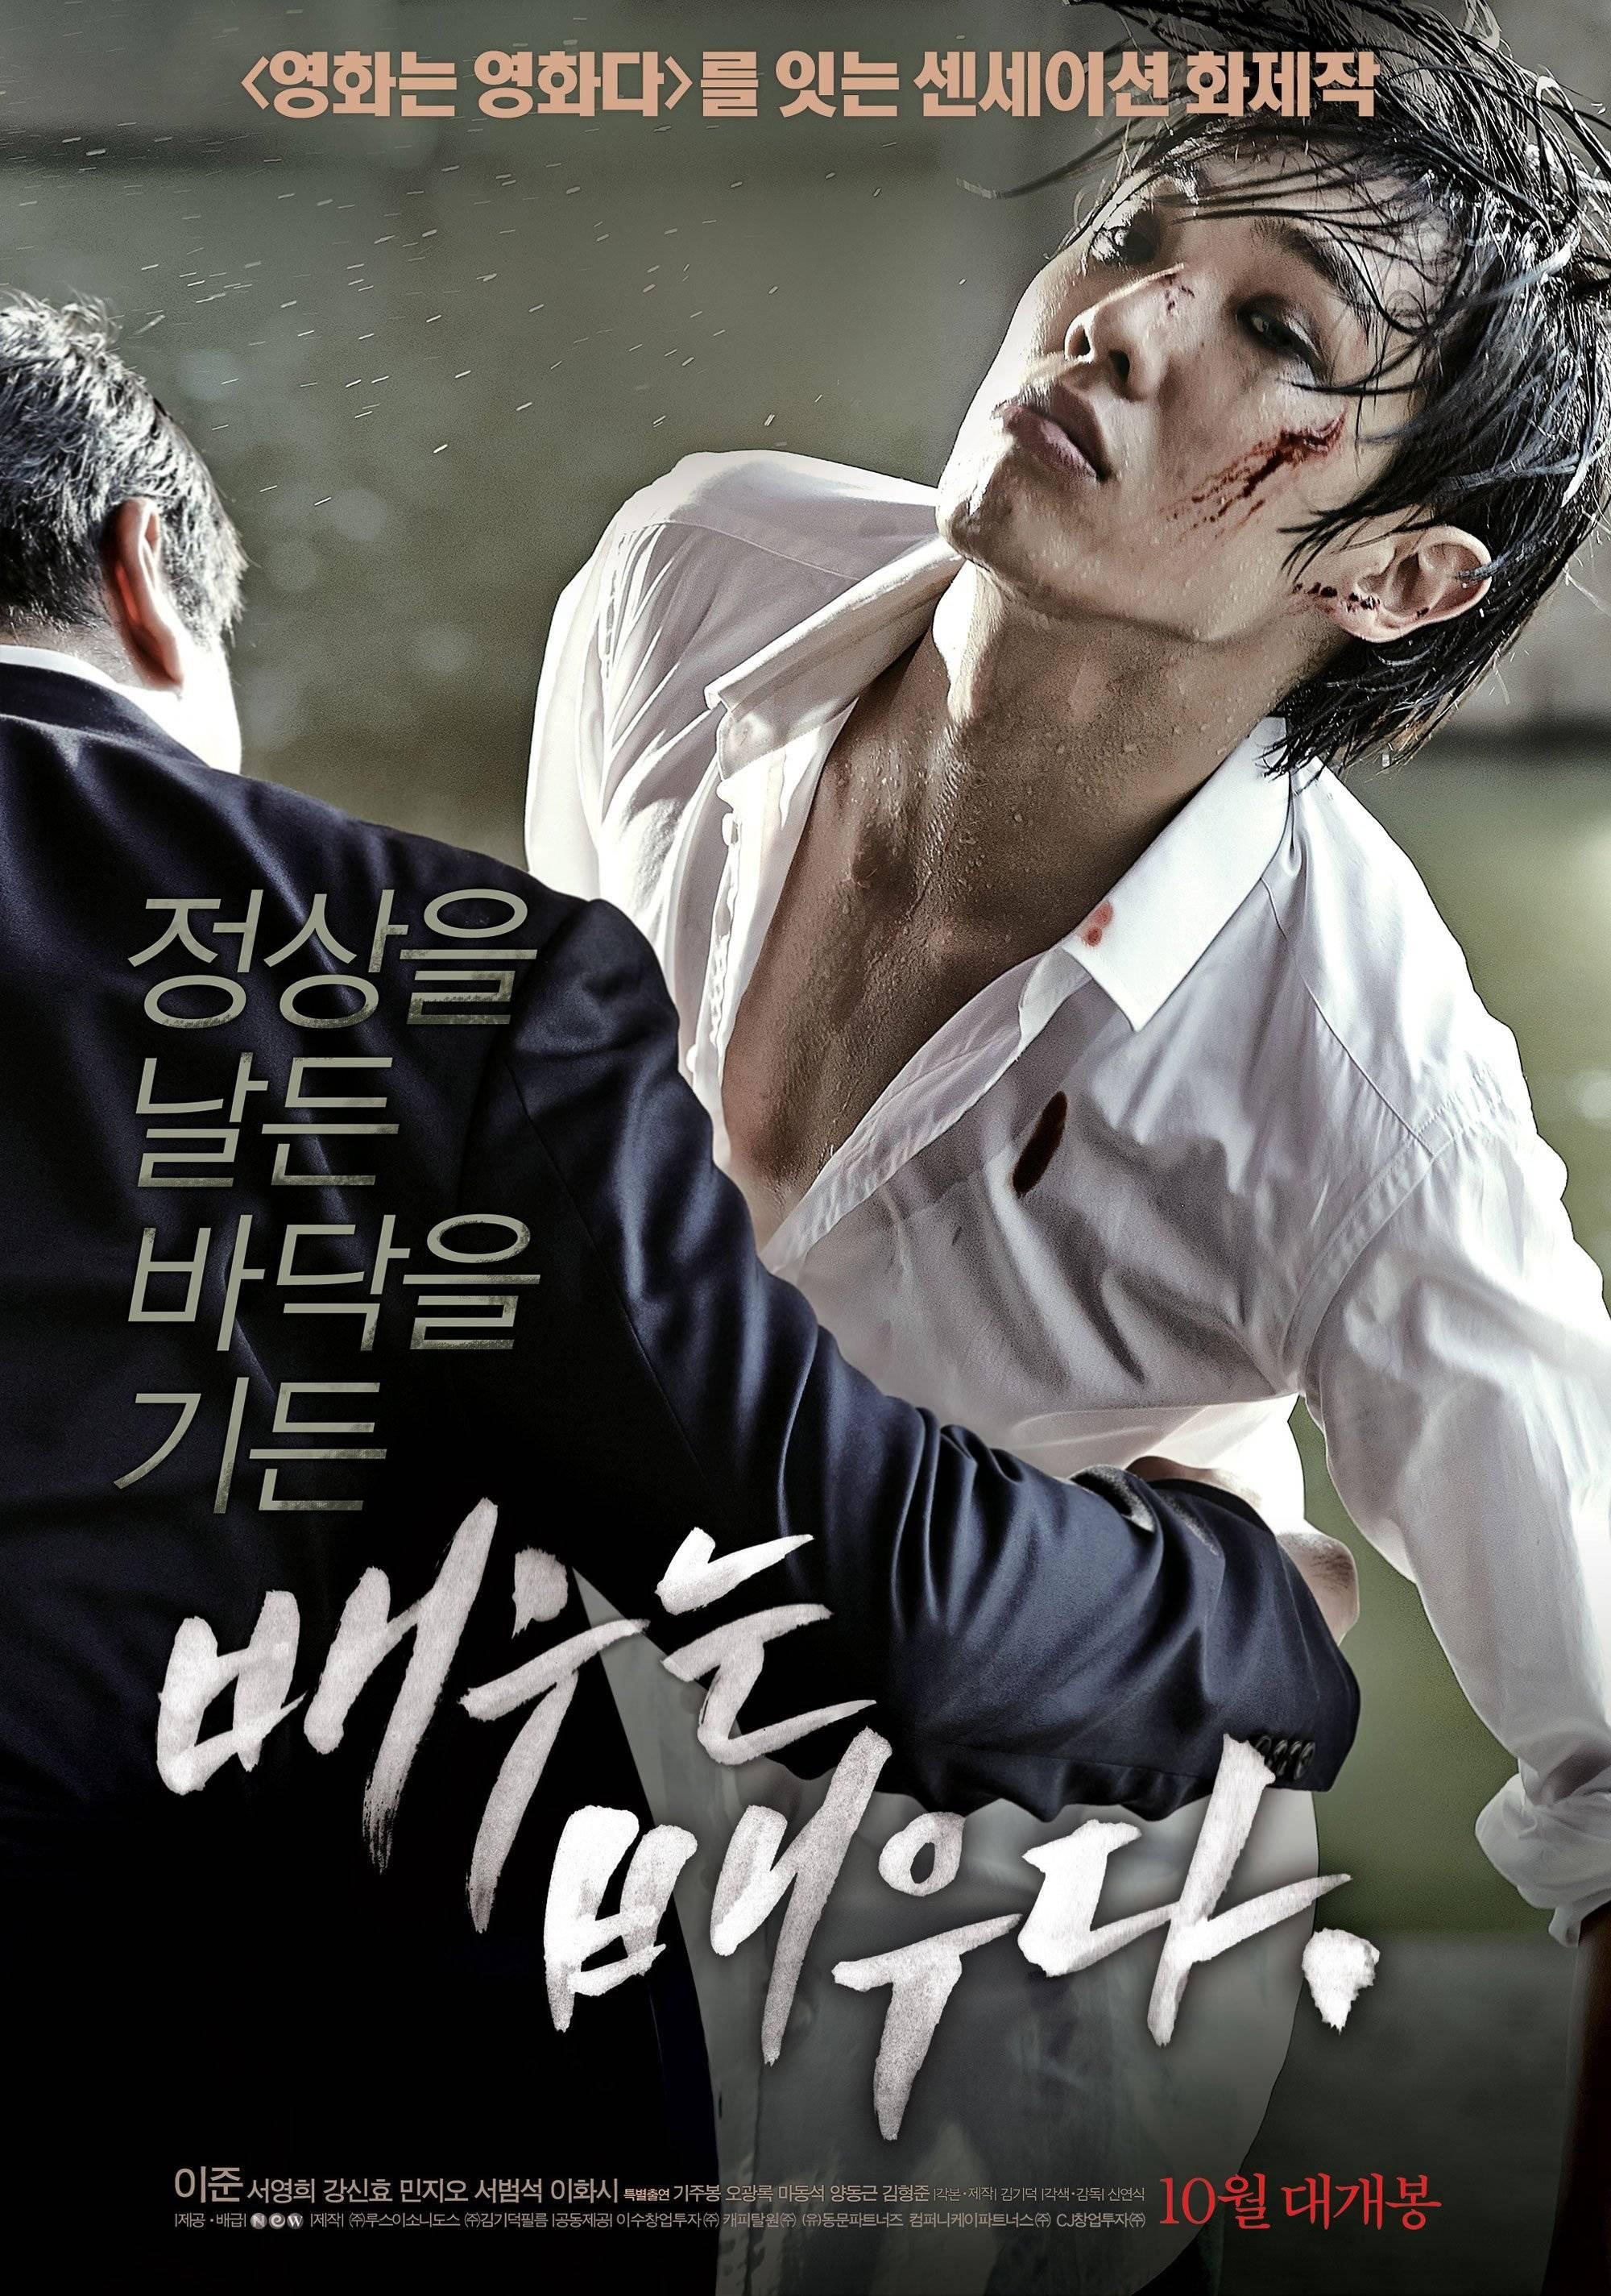 DOWNLOAD: July Drama - Rough Play Mp3, Video — Jukebox Music